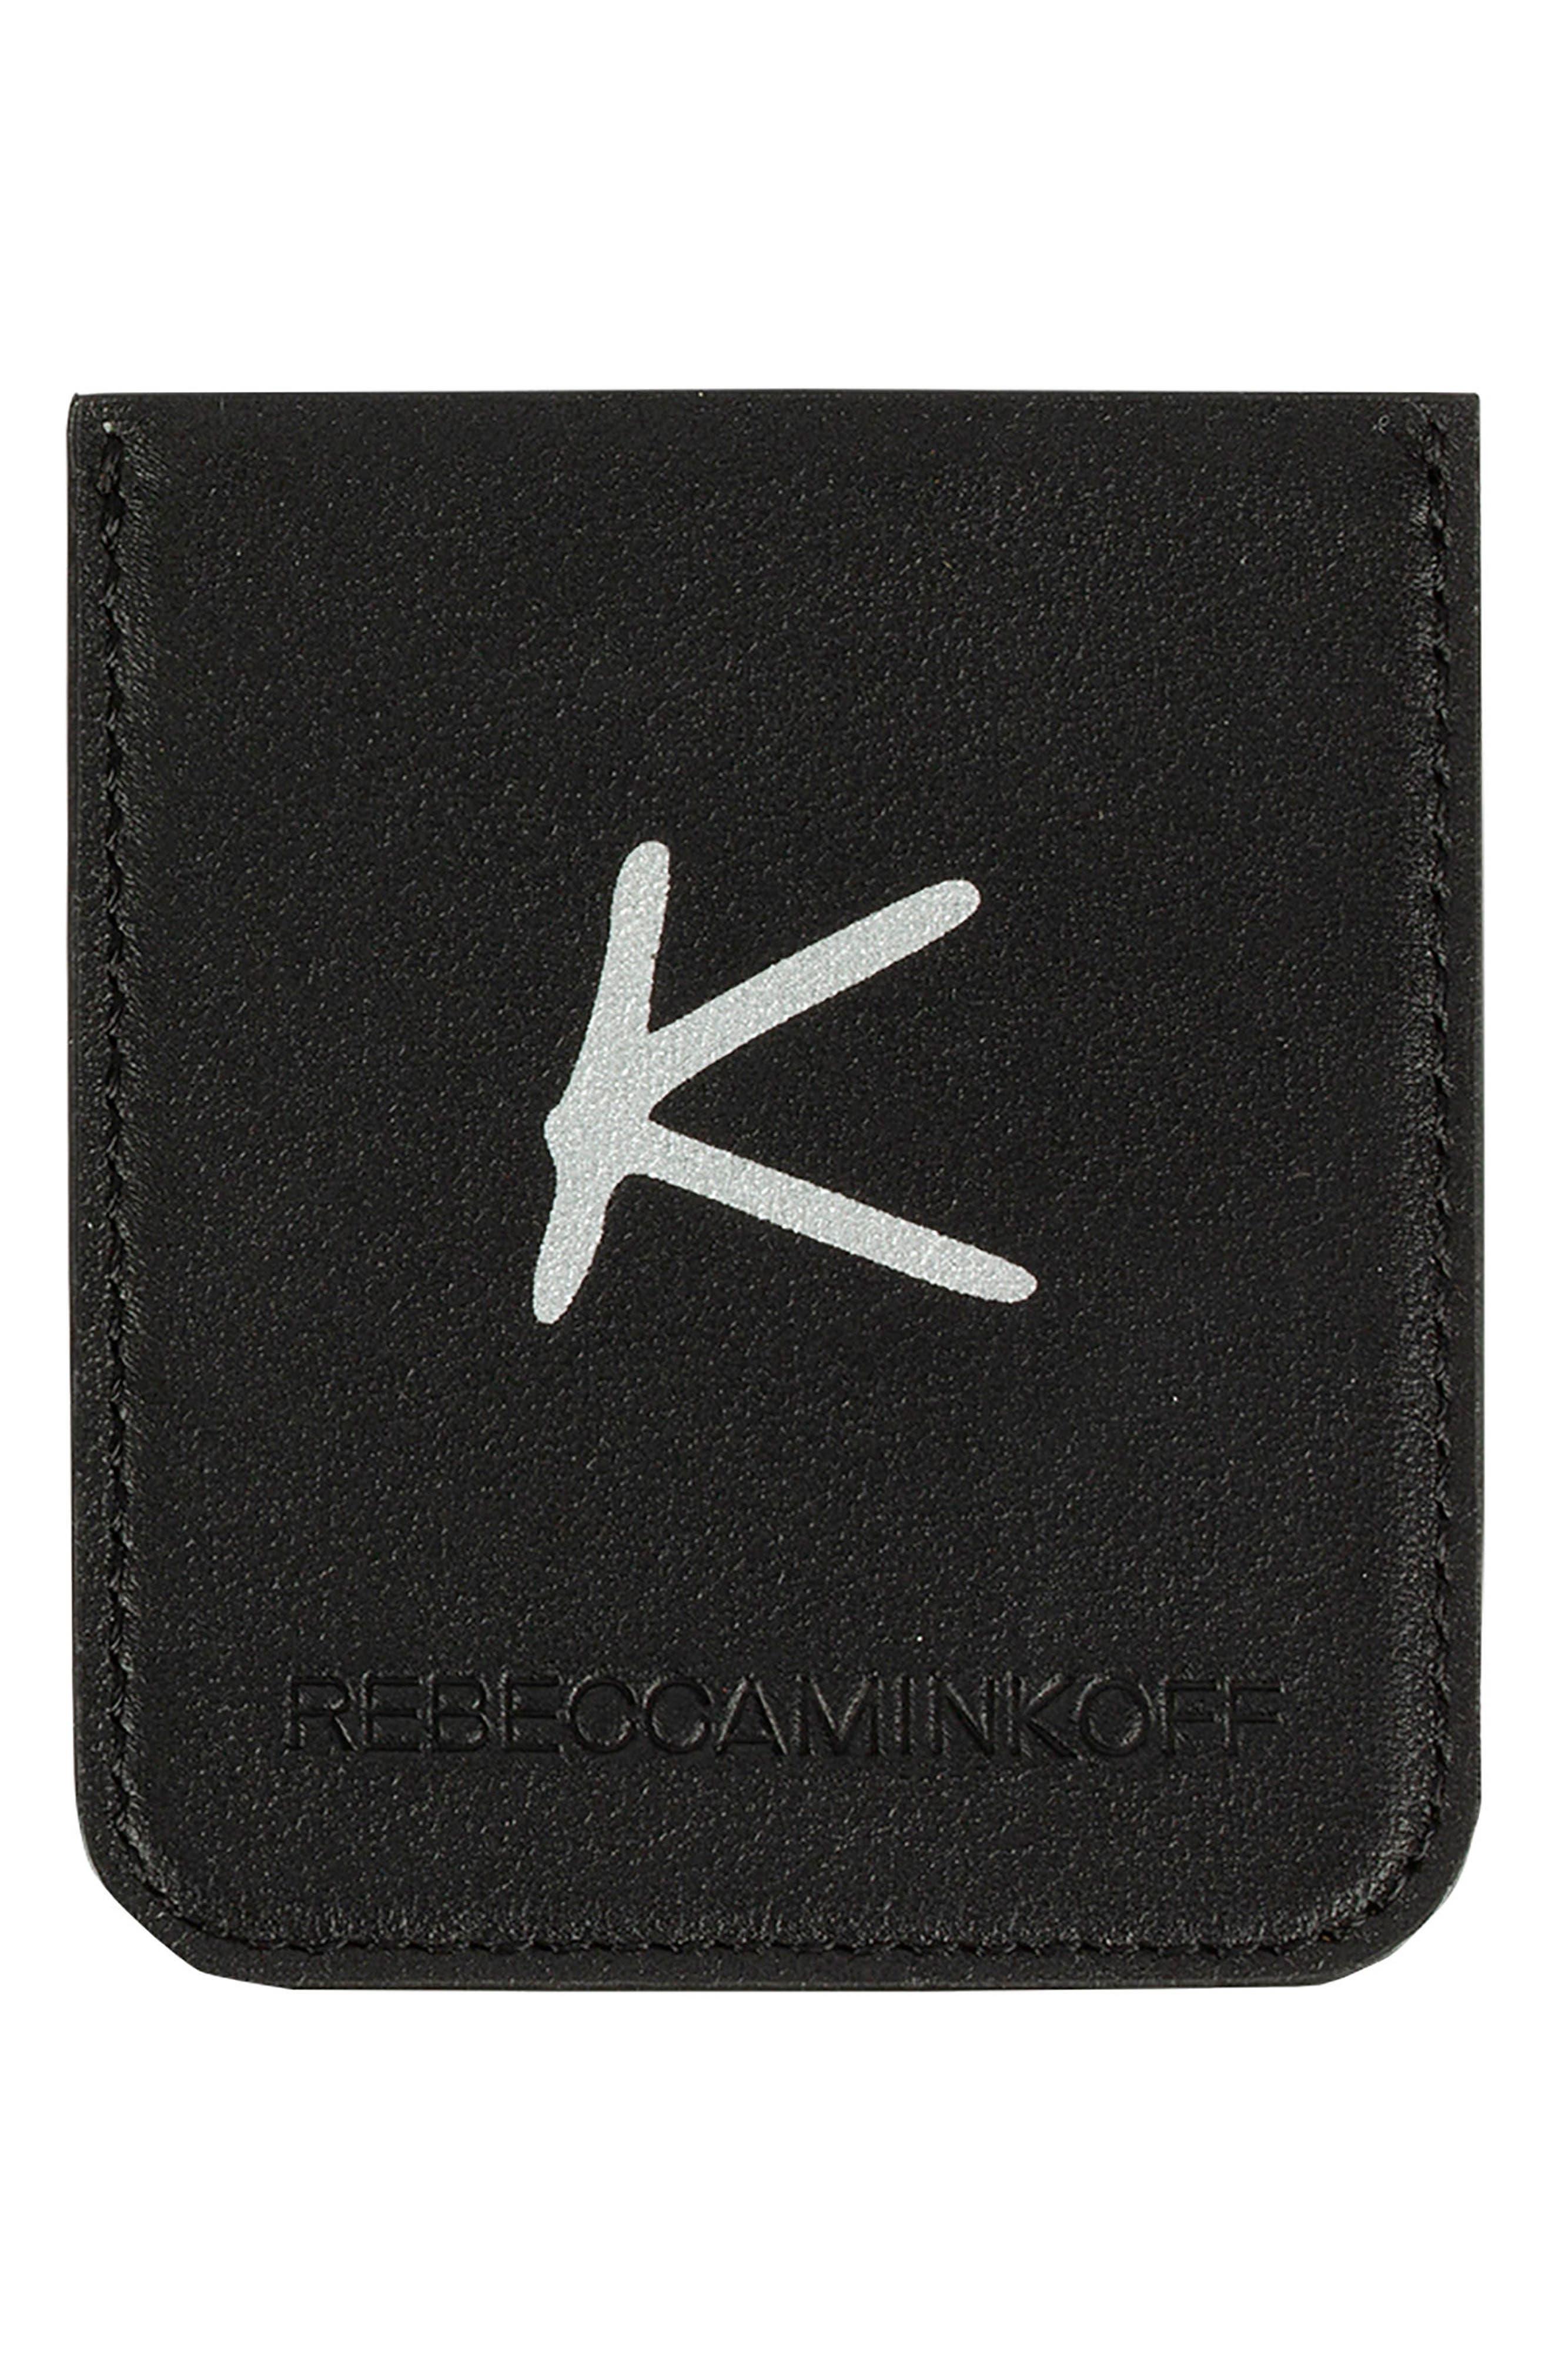 Initial Smartphone Sticker Pocket,                         Main,                         color, K - Black/ Silver Foil